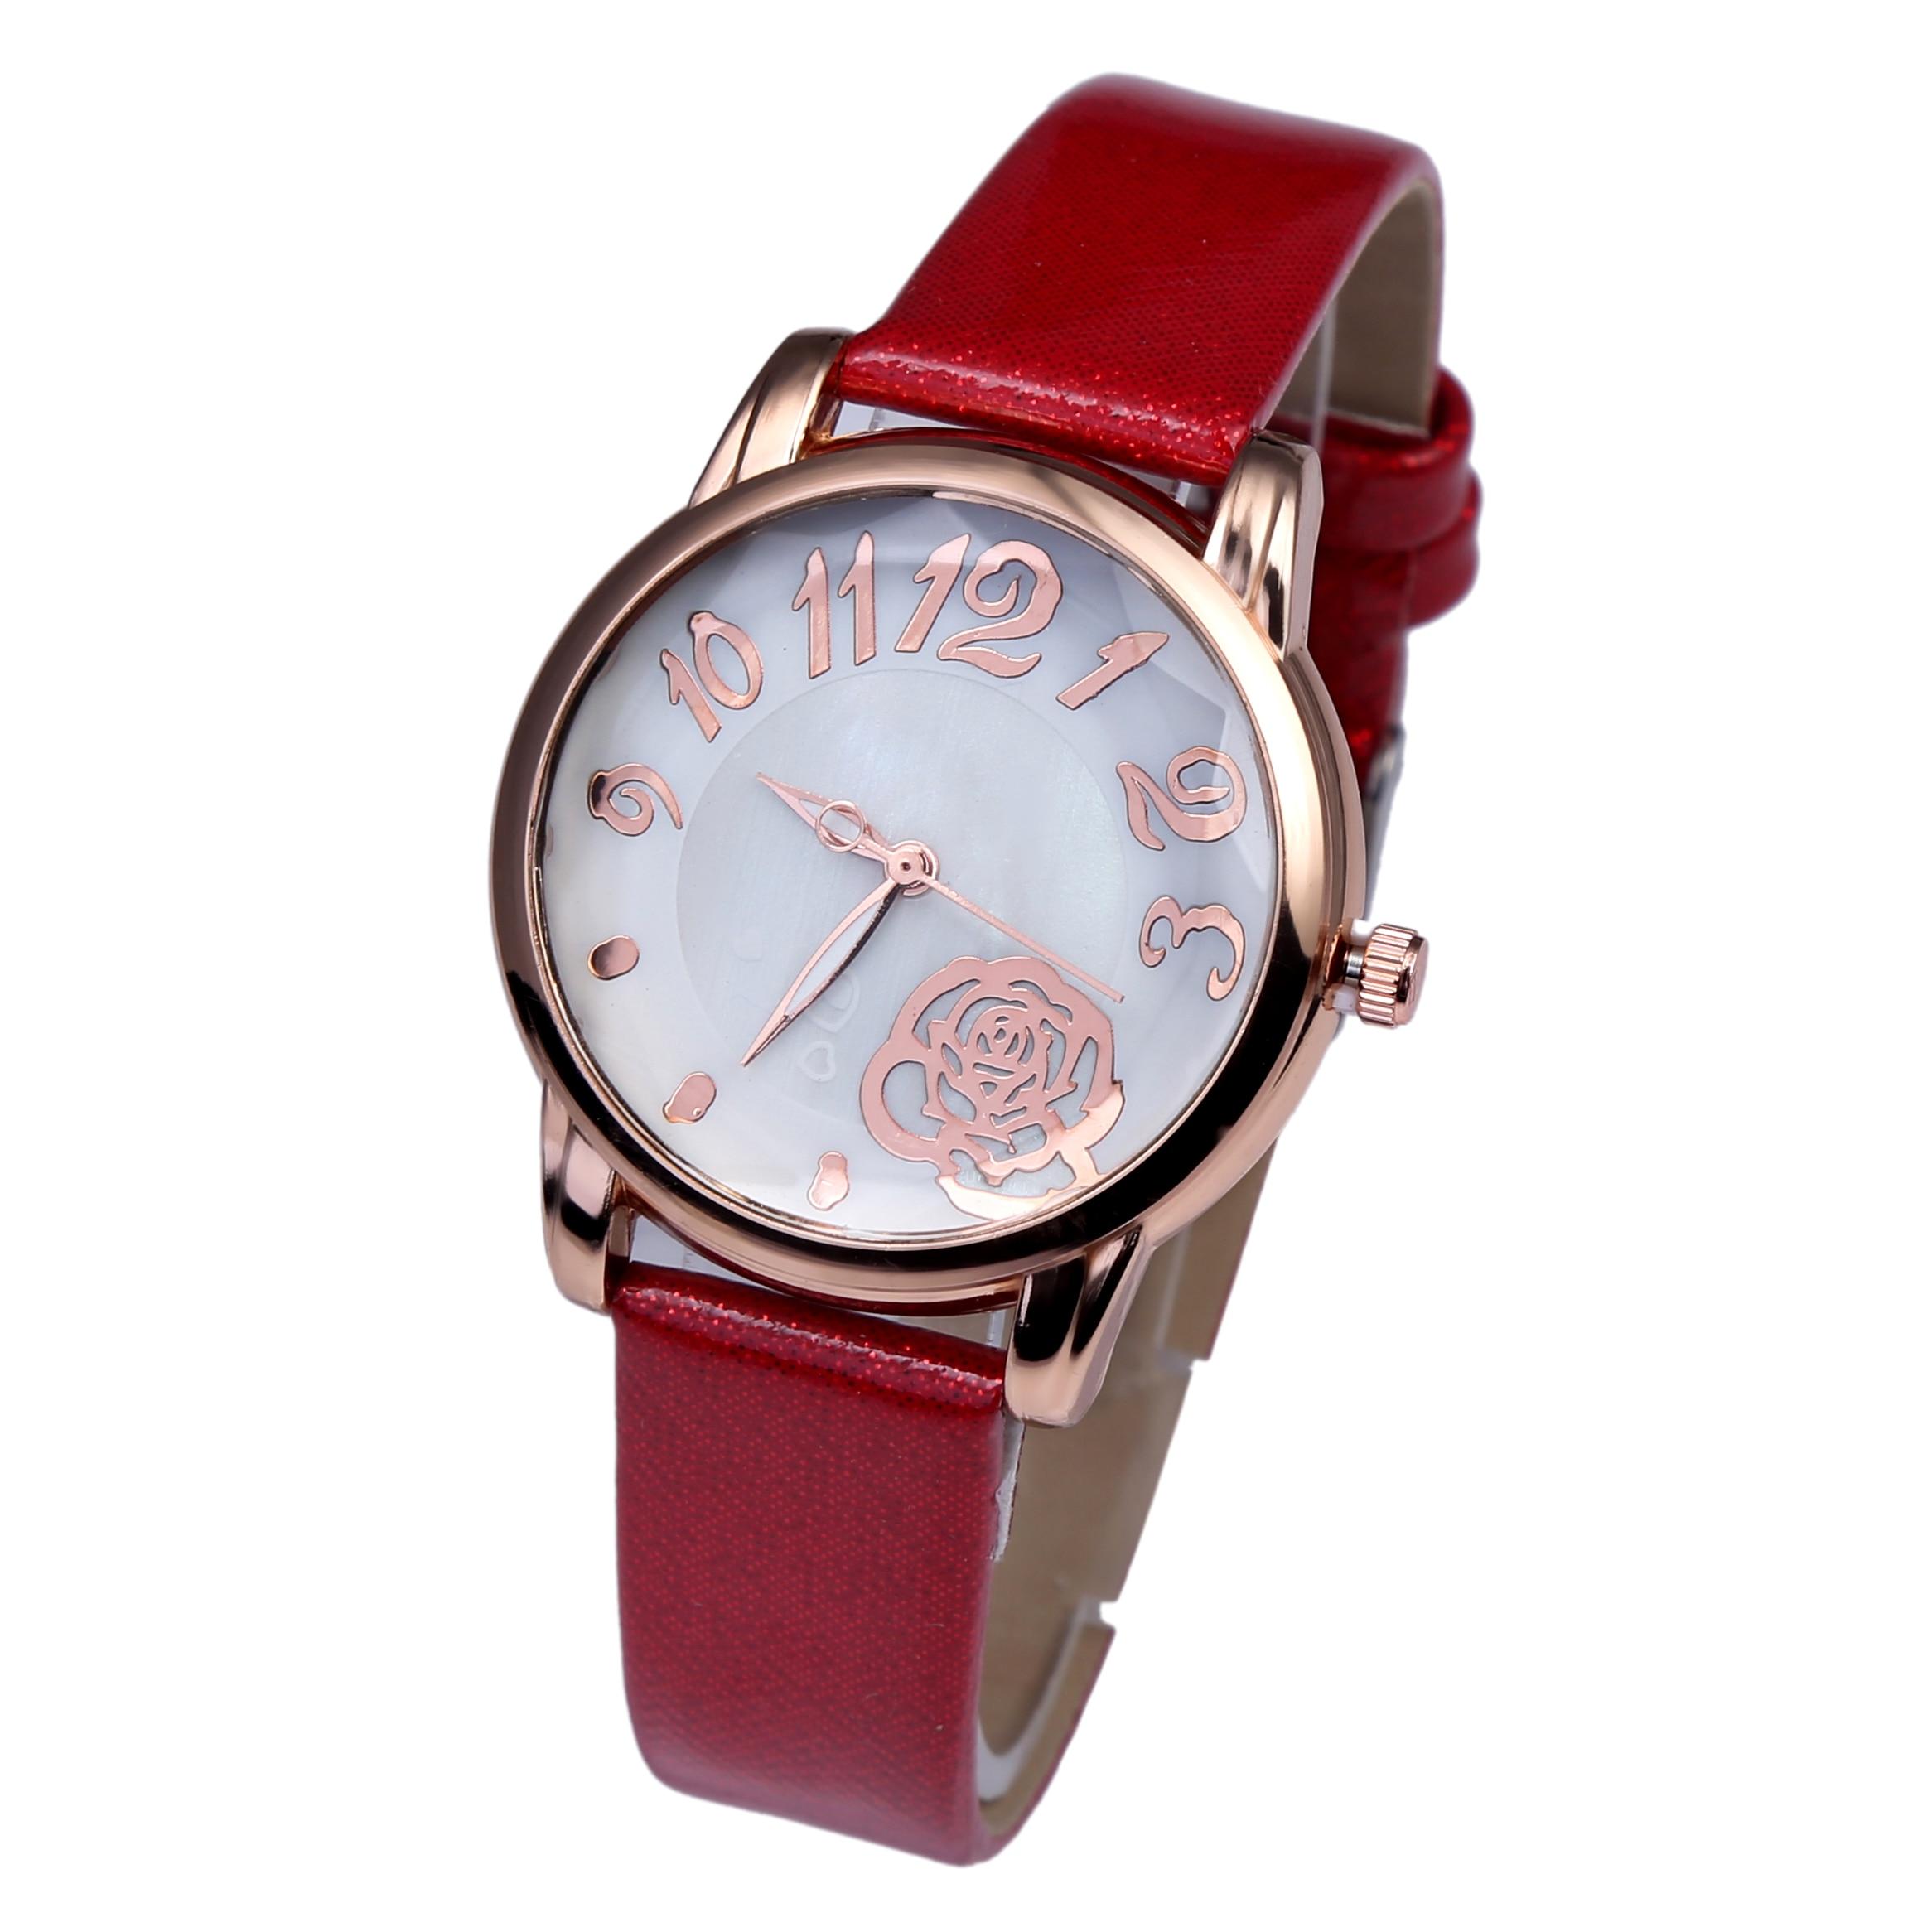 Women Watches 2019 Cheap Luxury Band Watch Montre Femme Ladies New Wristwatches Leather Top Brand Quartz Watch Montre Relogio